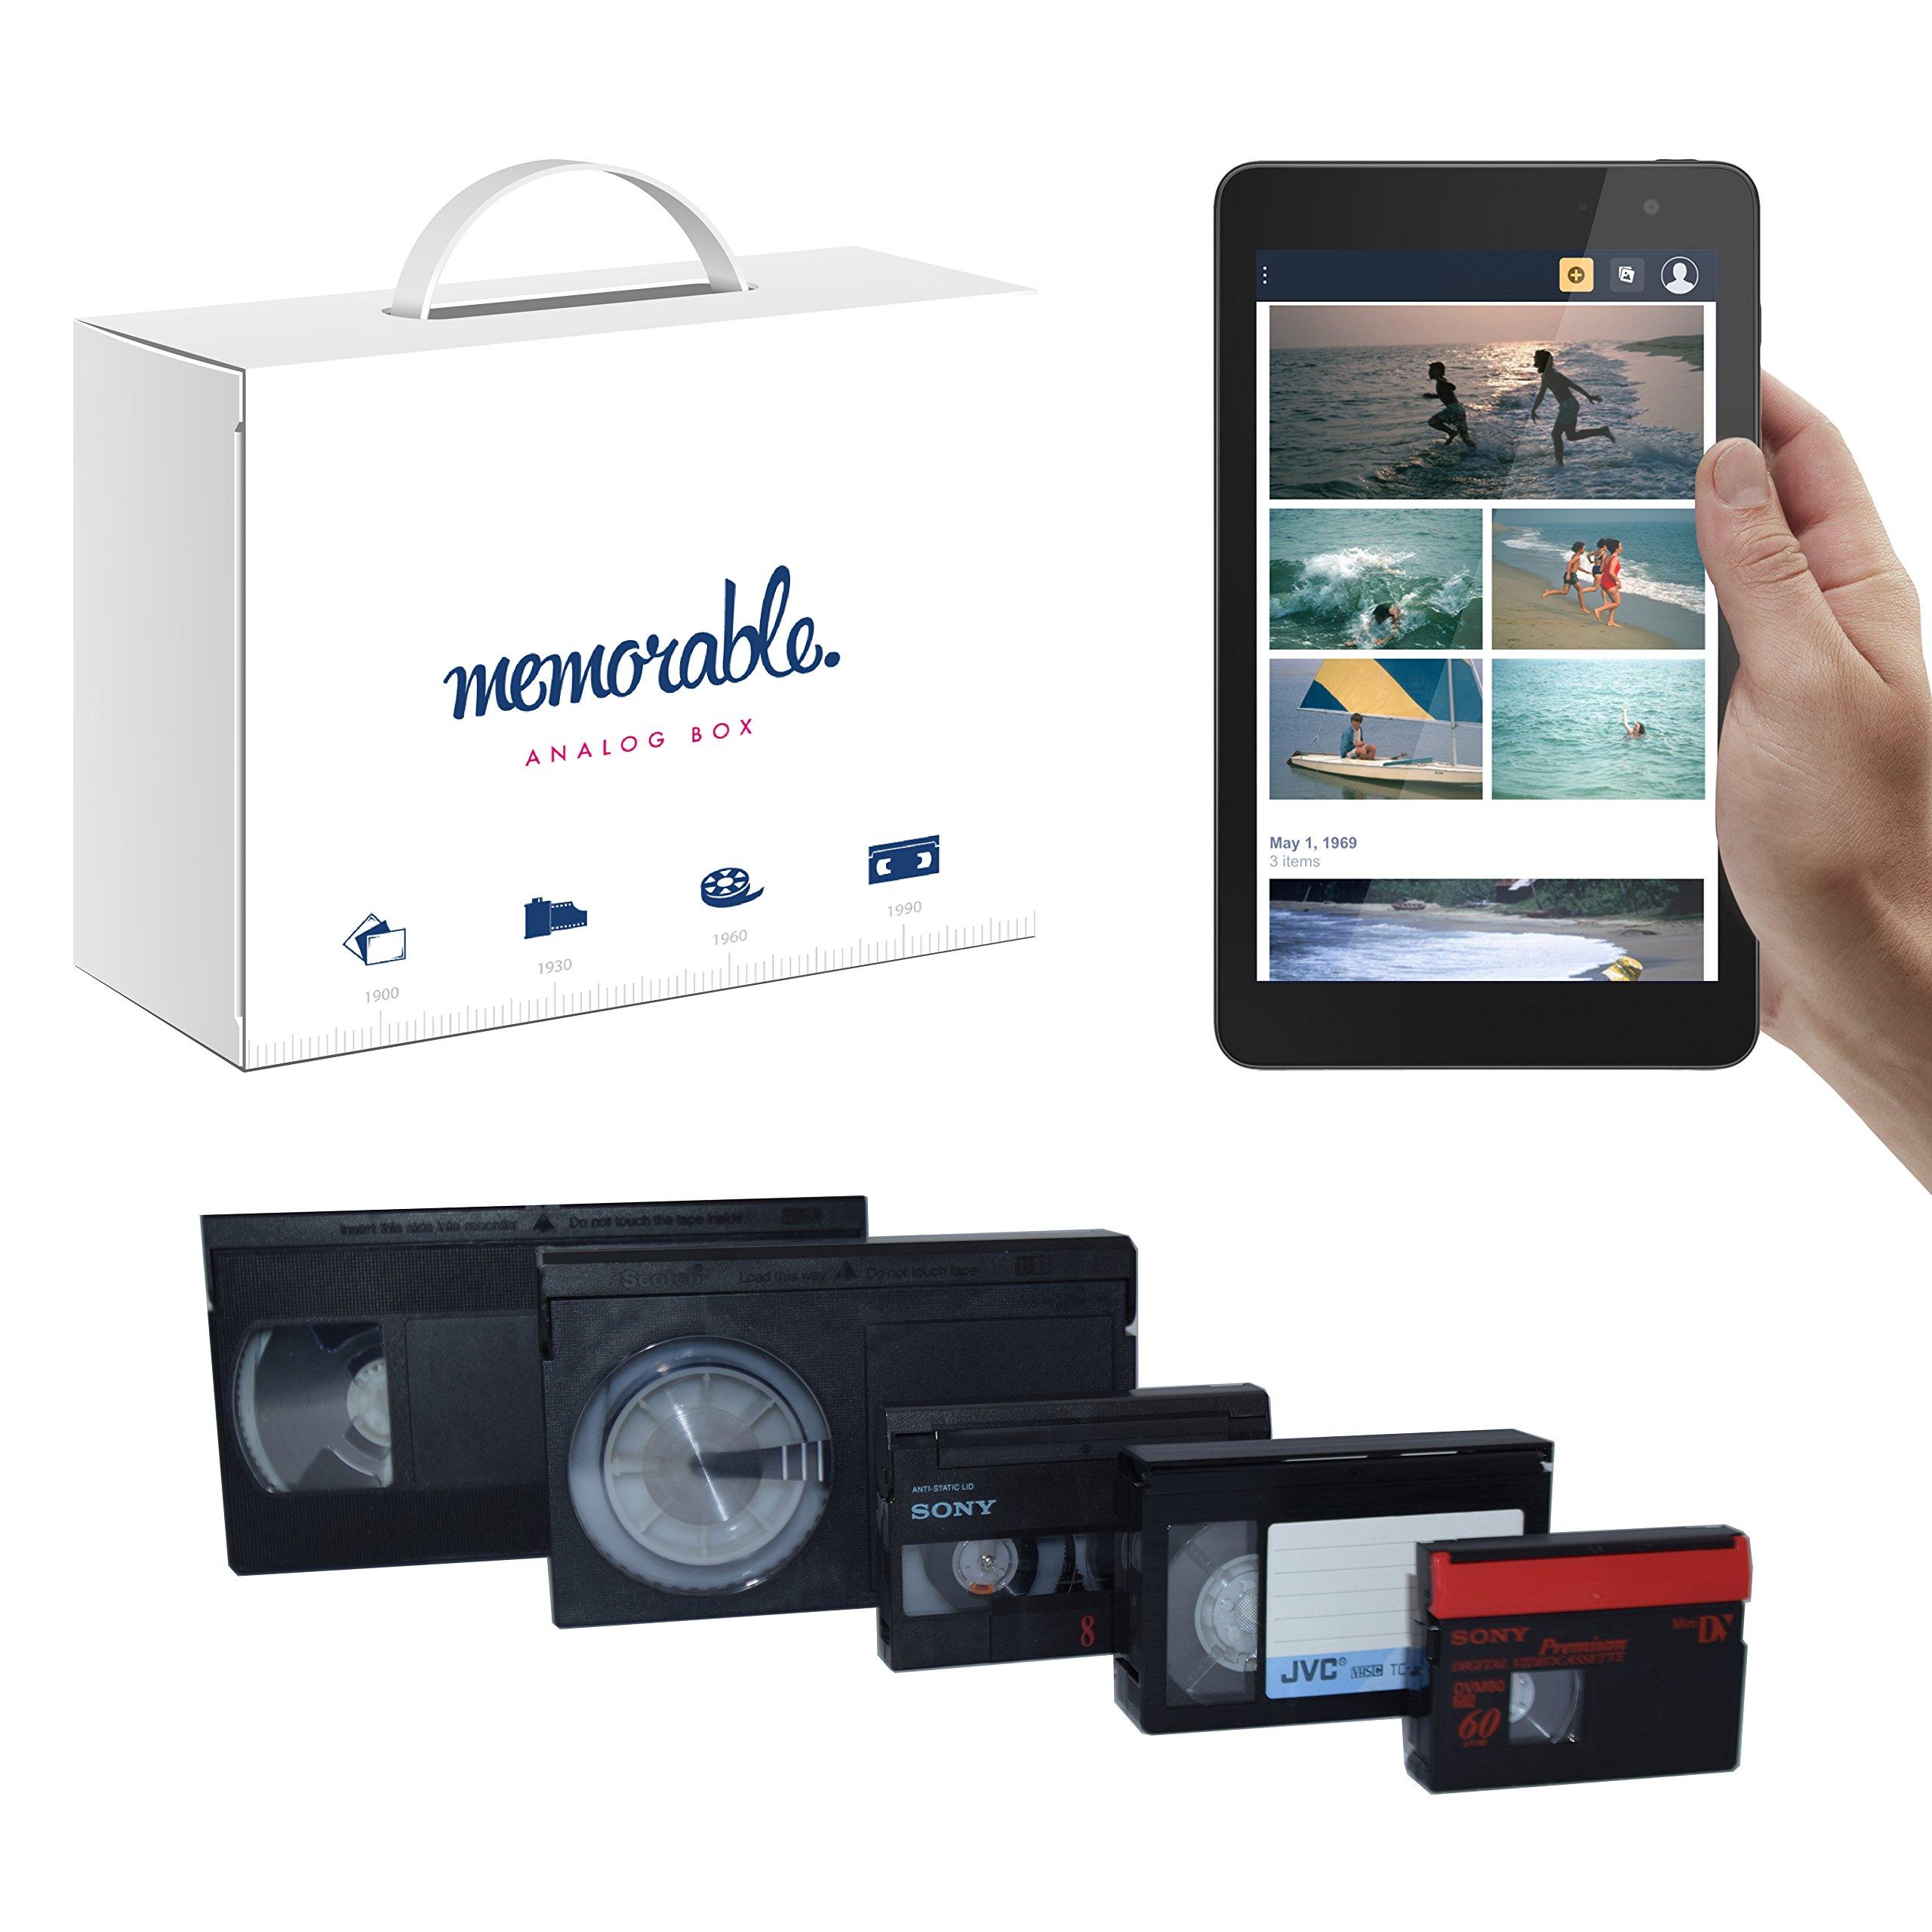 Memorable Video Transfer Service (VHS, 8mm, Hi-8, MiniDV) to Prime Photos - 1 Tape